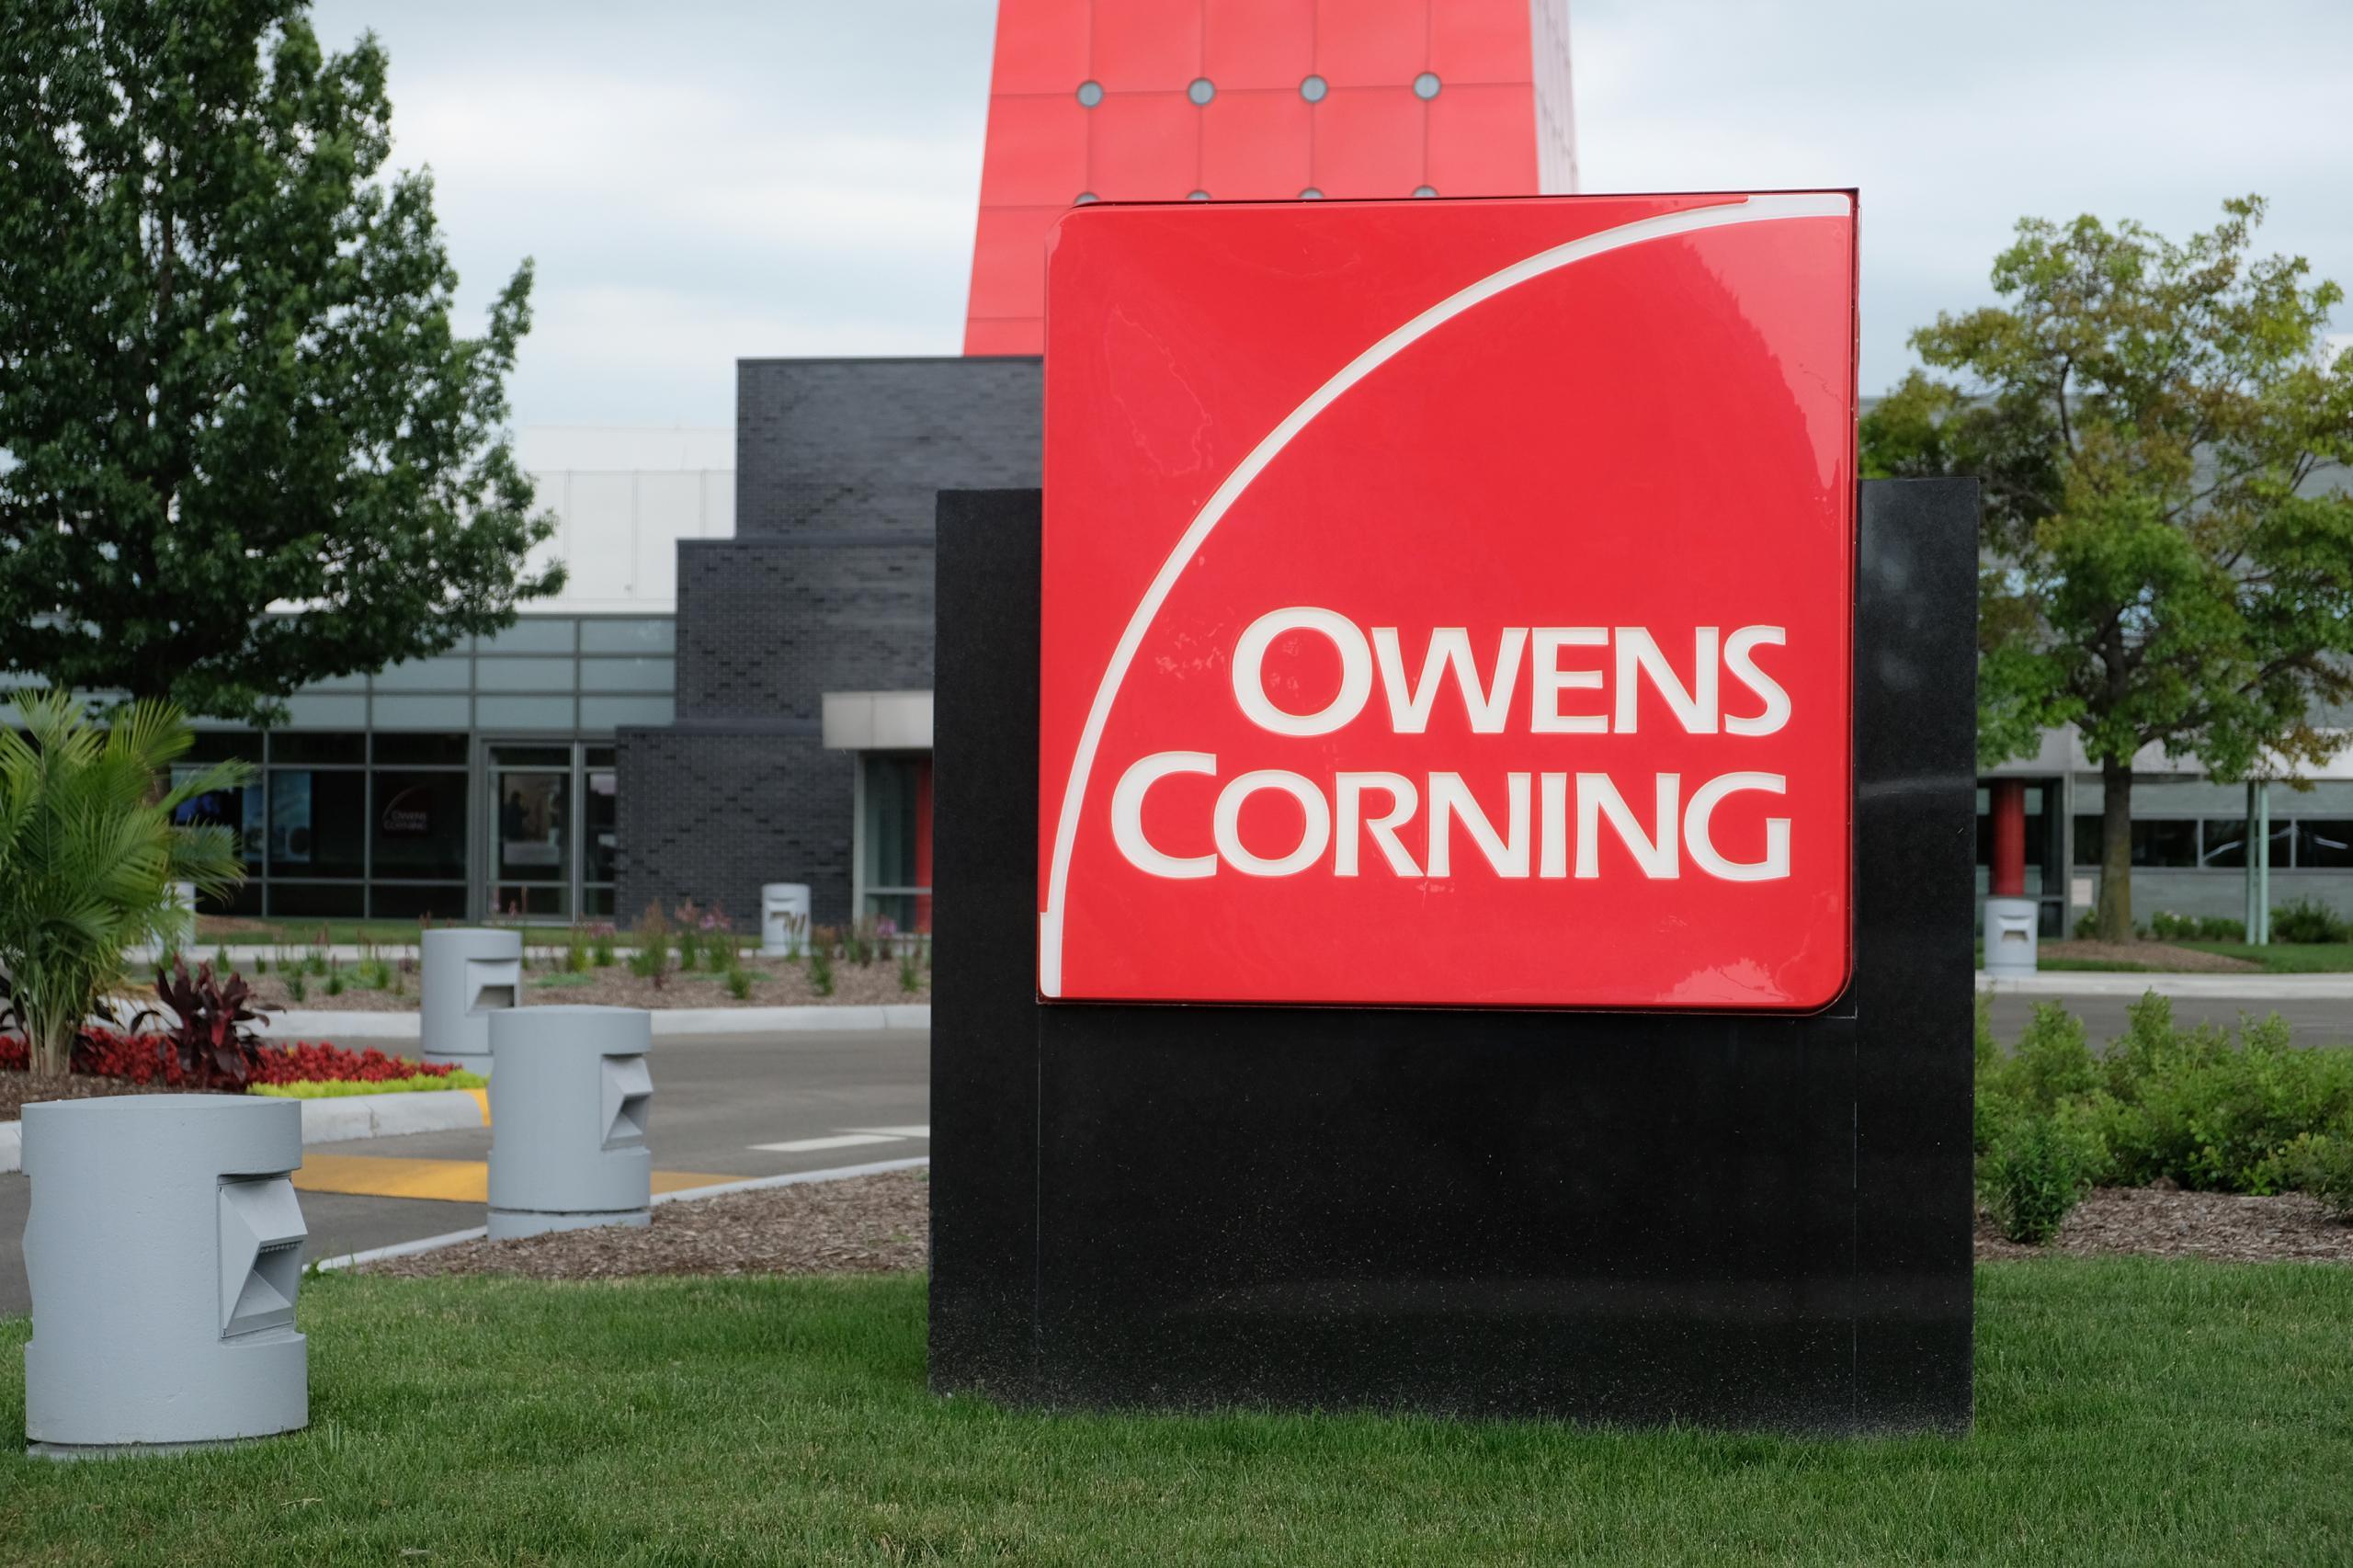 Entrance to Owens Corning's corporate headquarters in Toledo, Ohio.